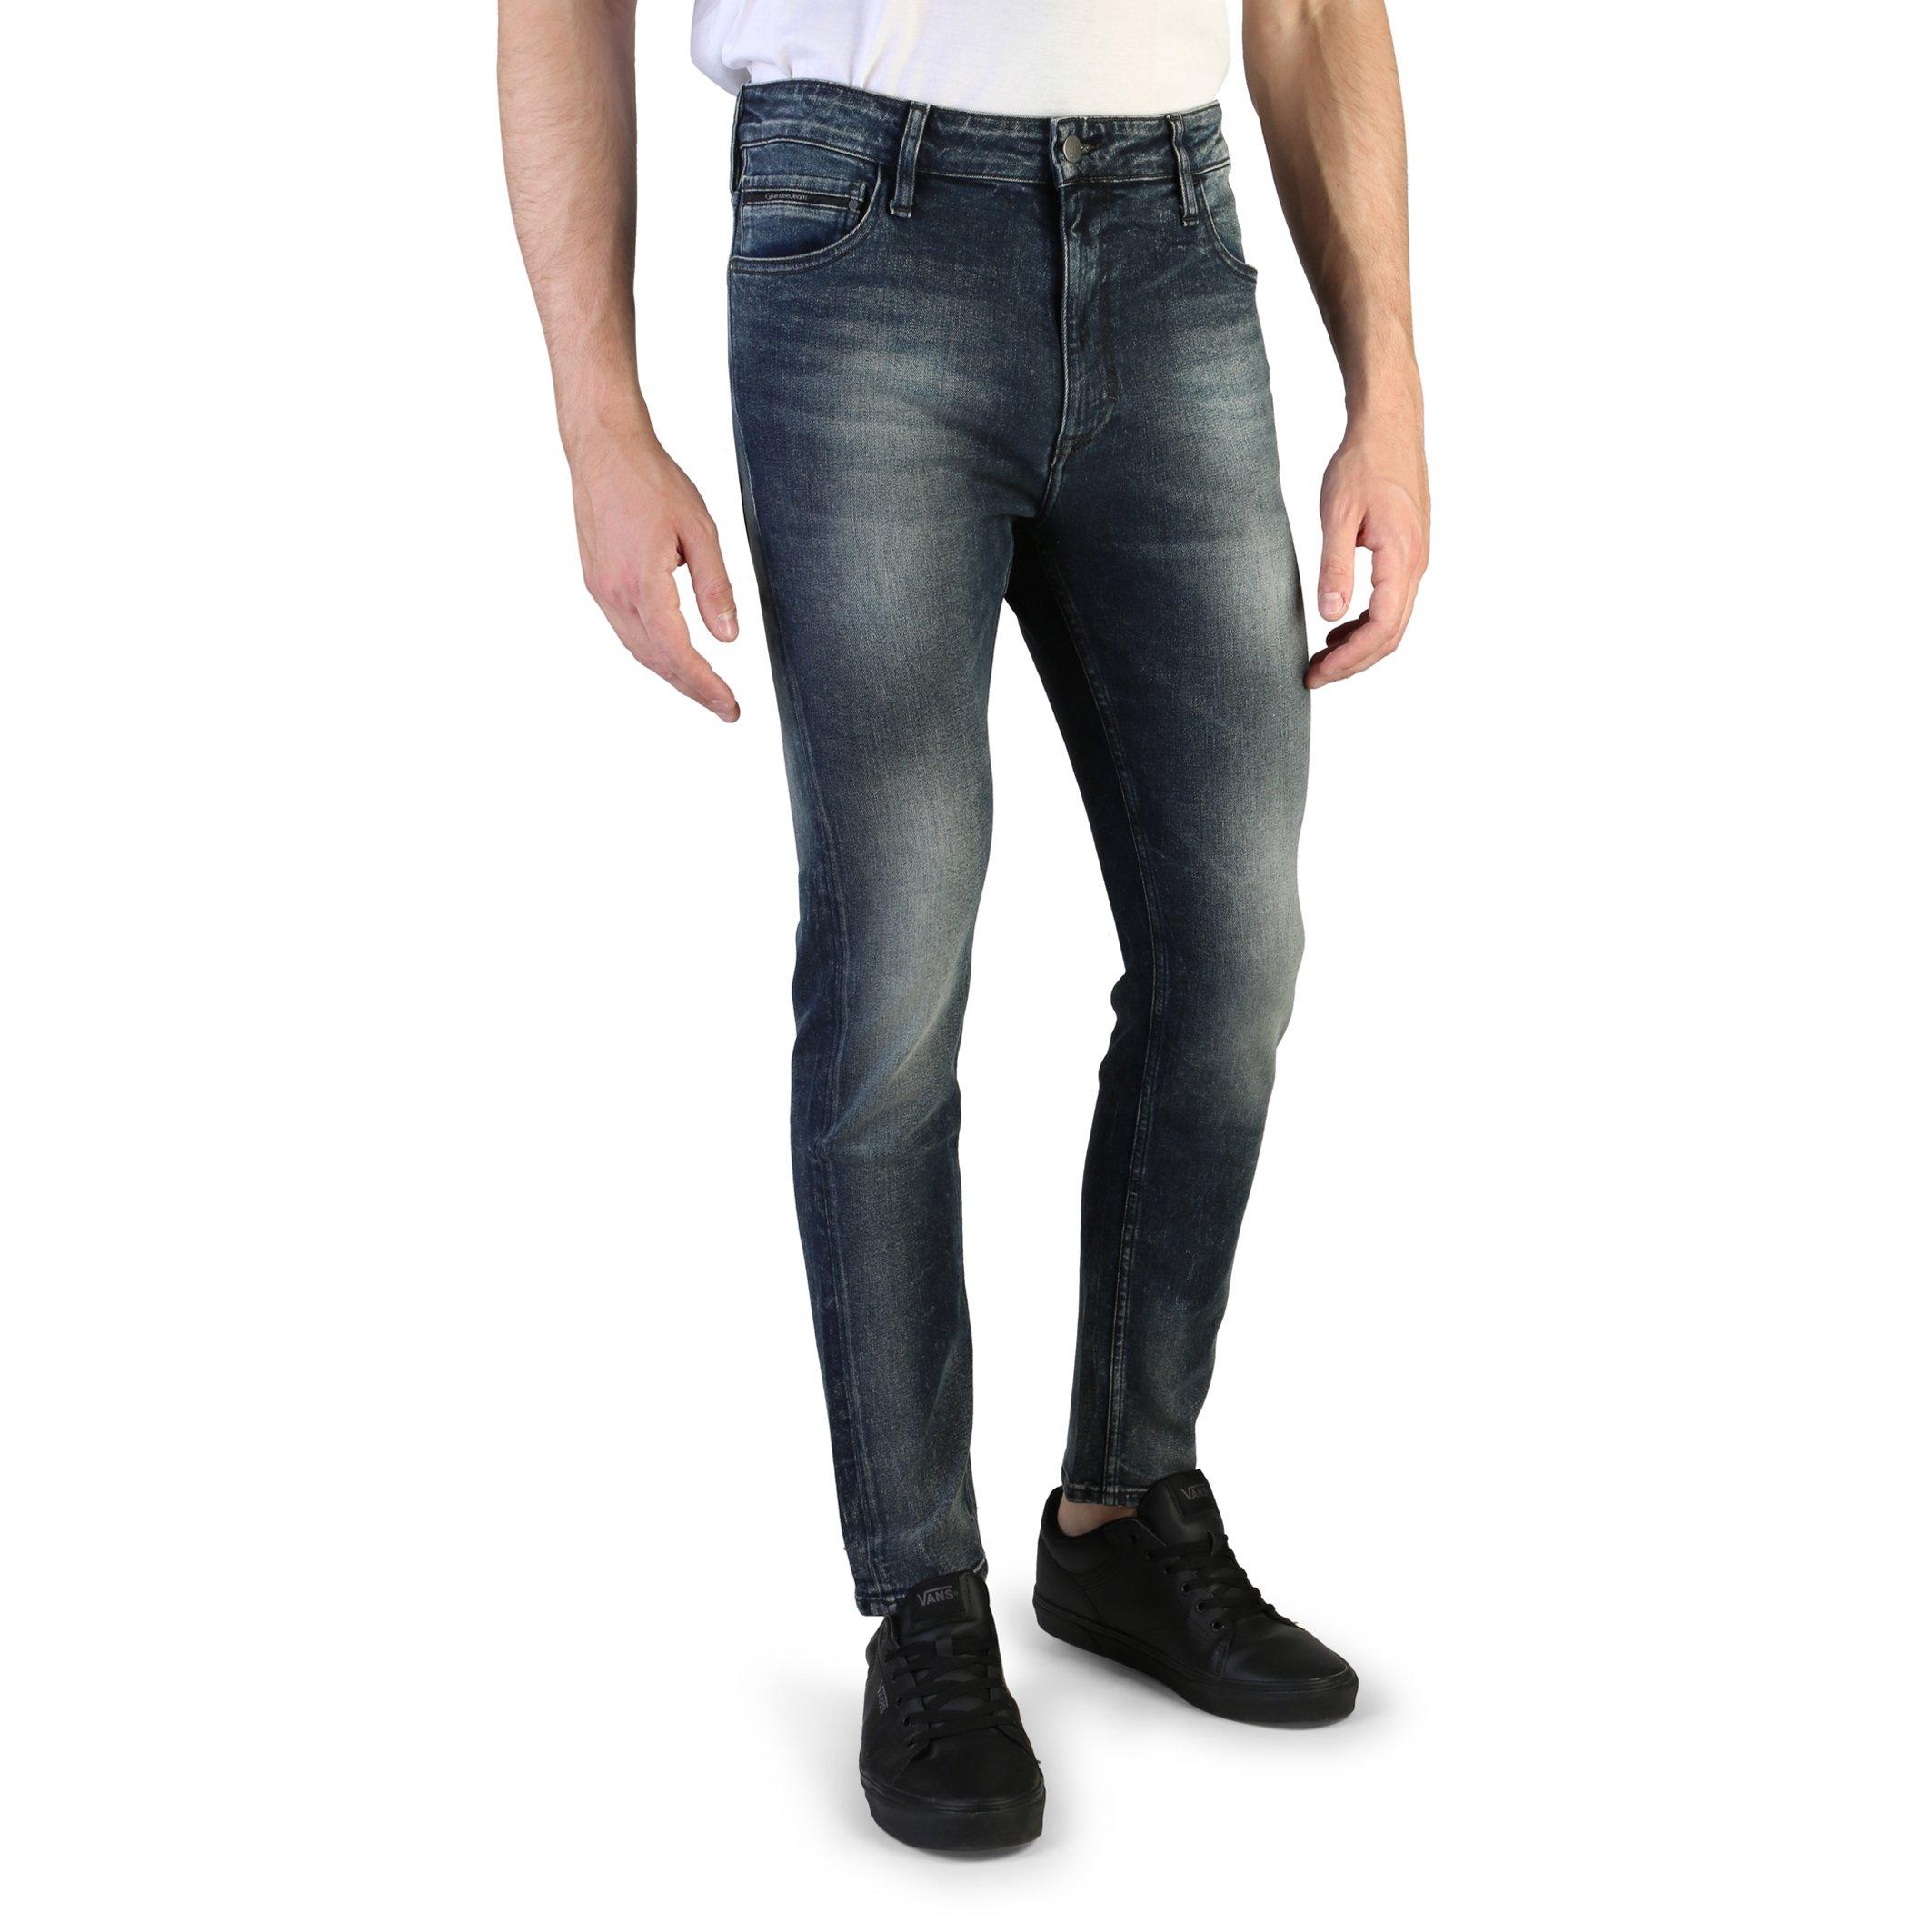 Calvin Klein Men's Jeans Blue J30J305740 - blue-2 30